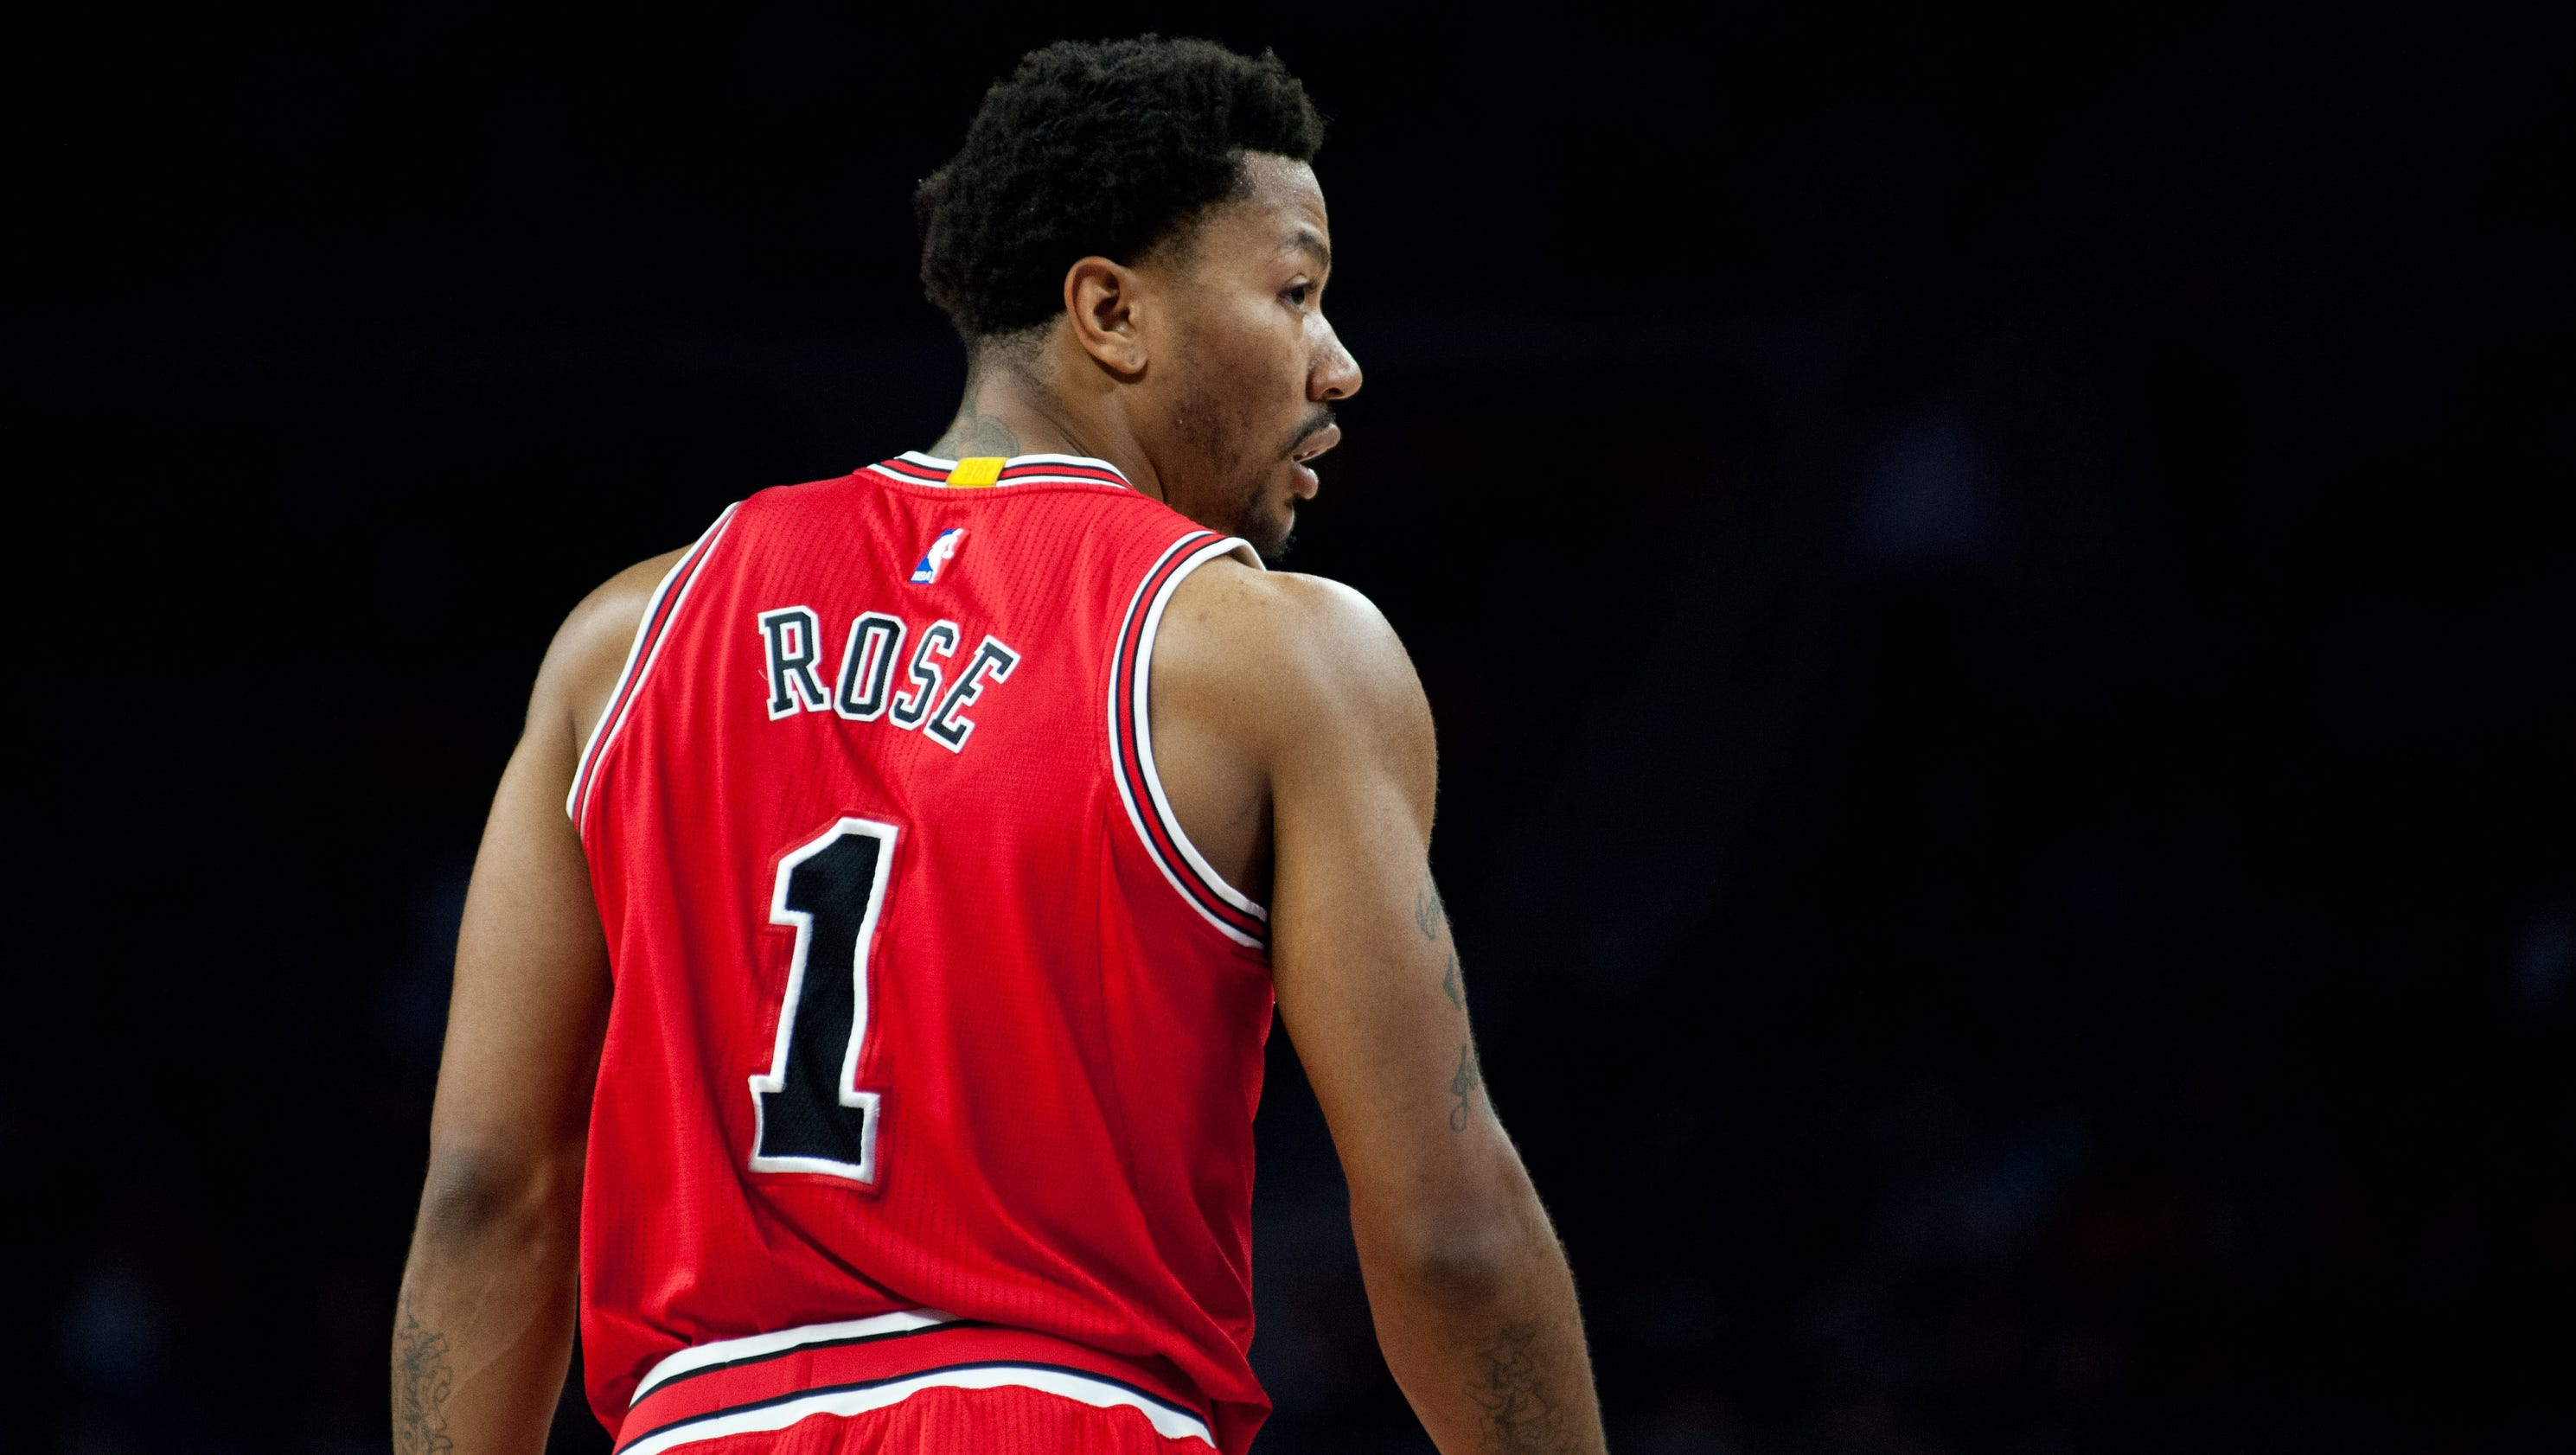 Bulls' Derrick Rose has knee injury, needs surgery